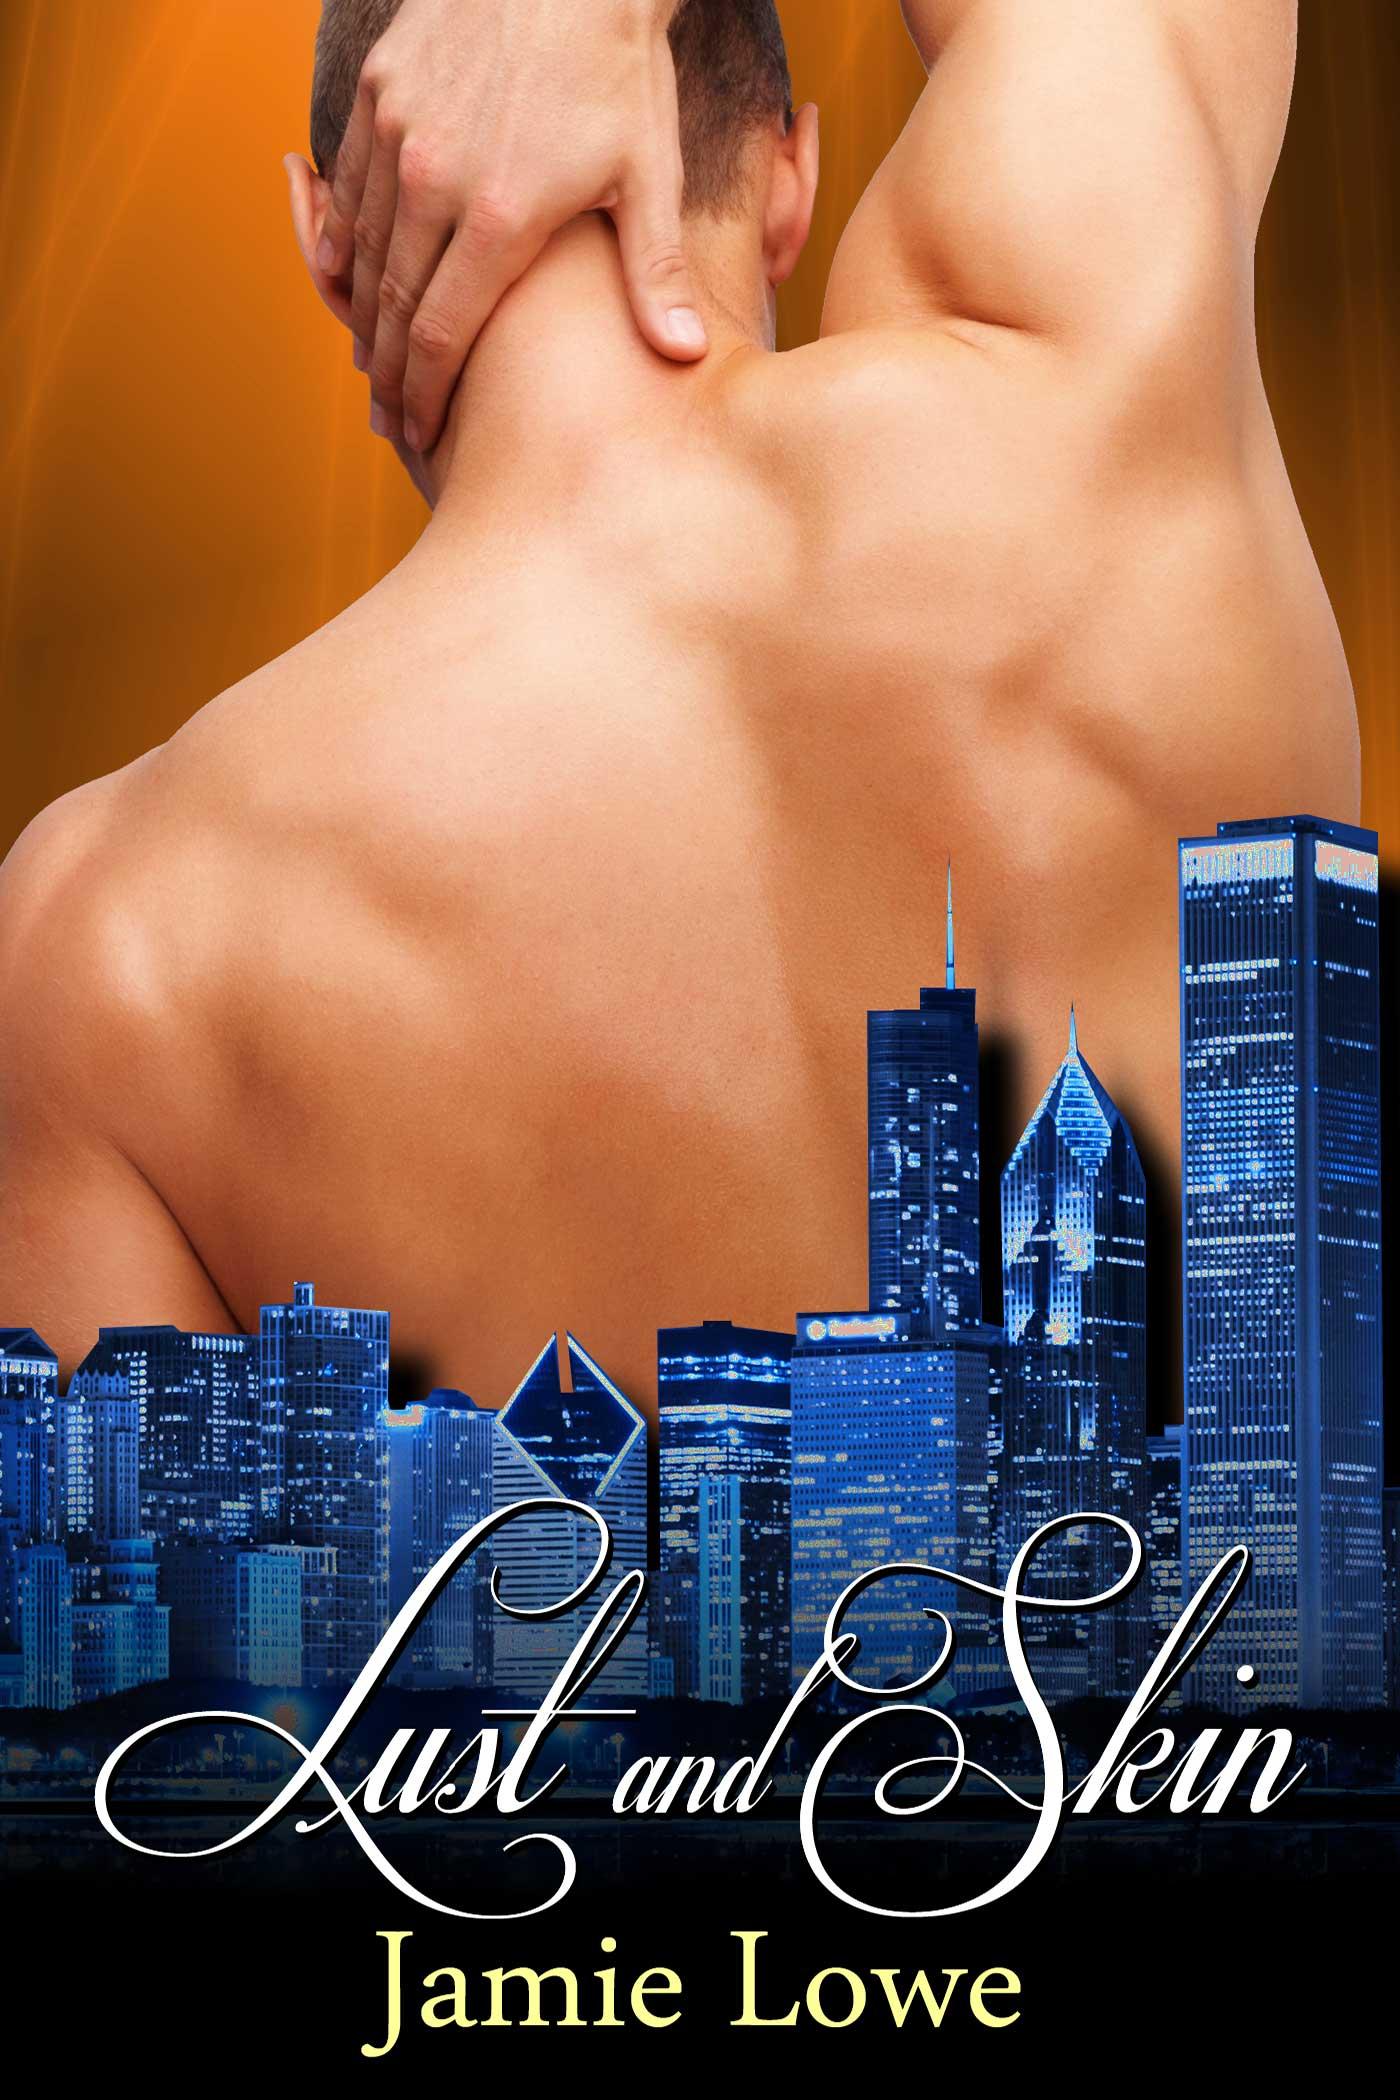 Jamie Lowe - Lust and Skin